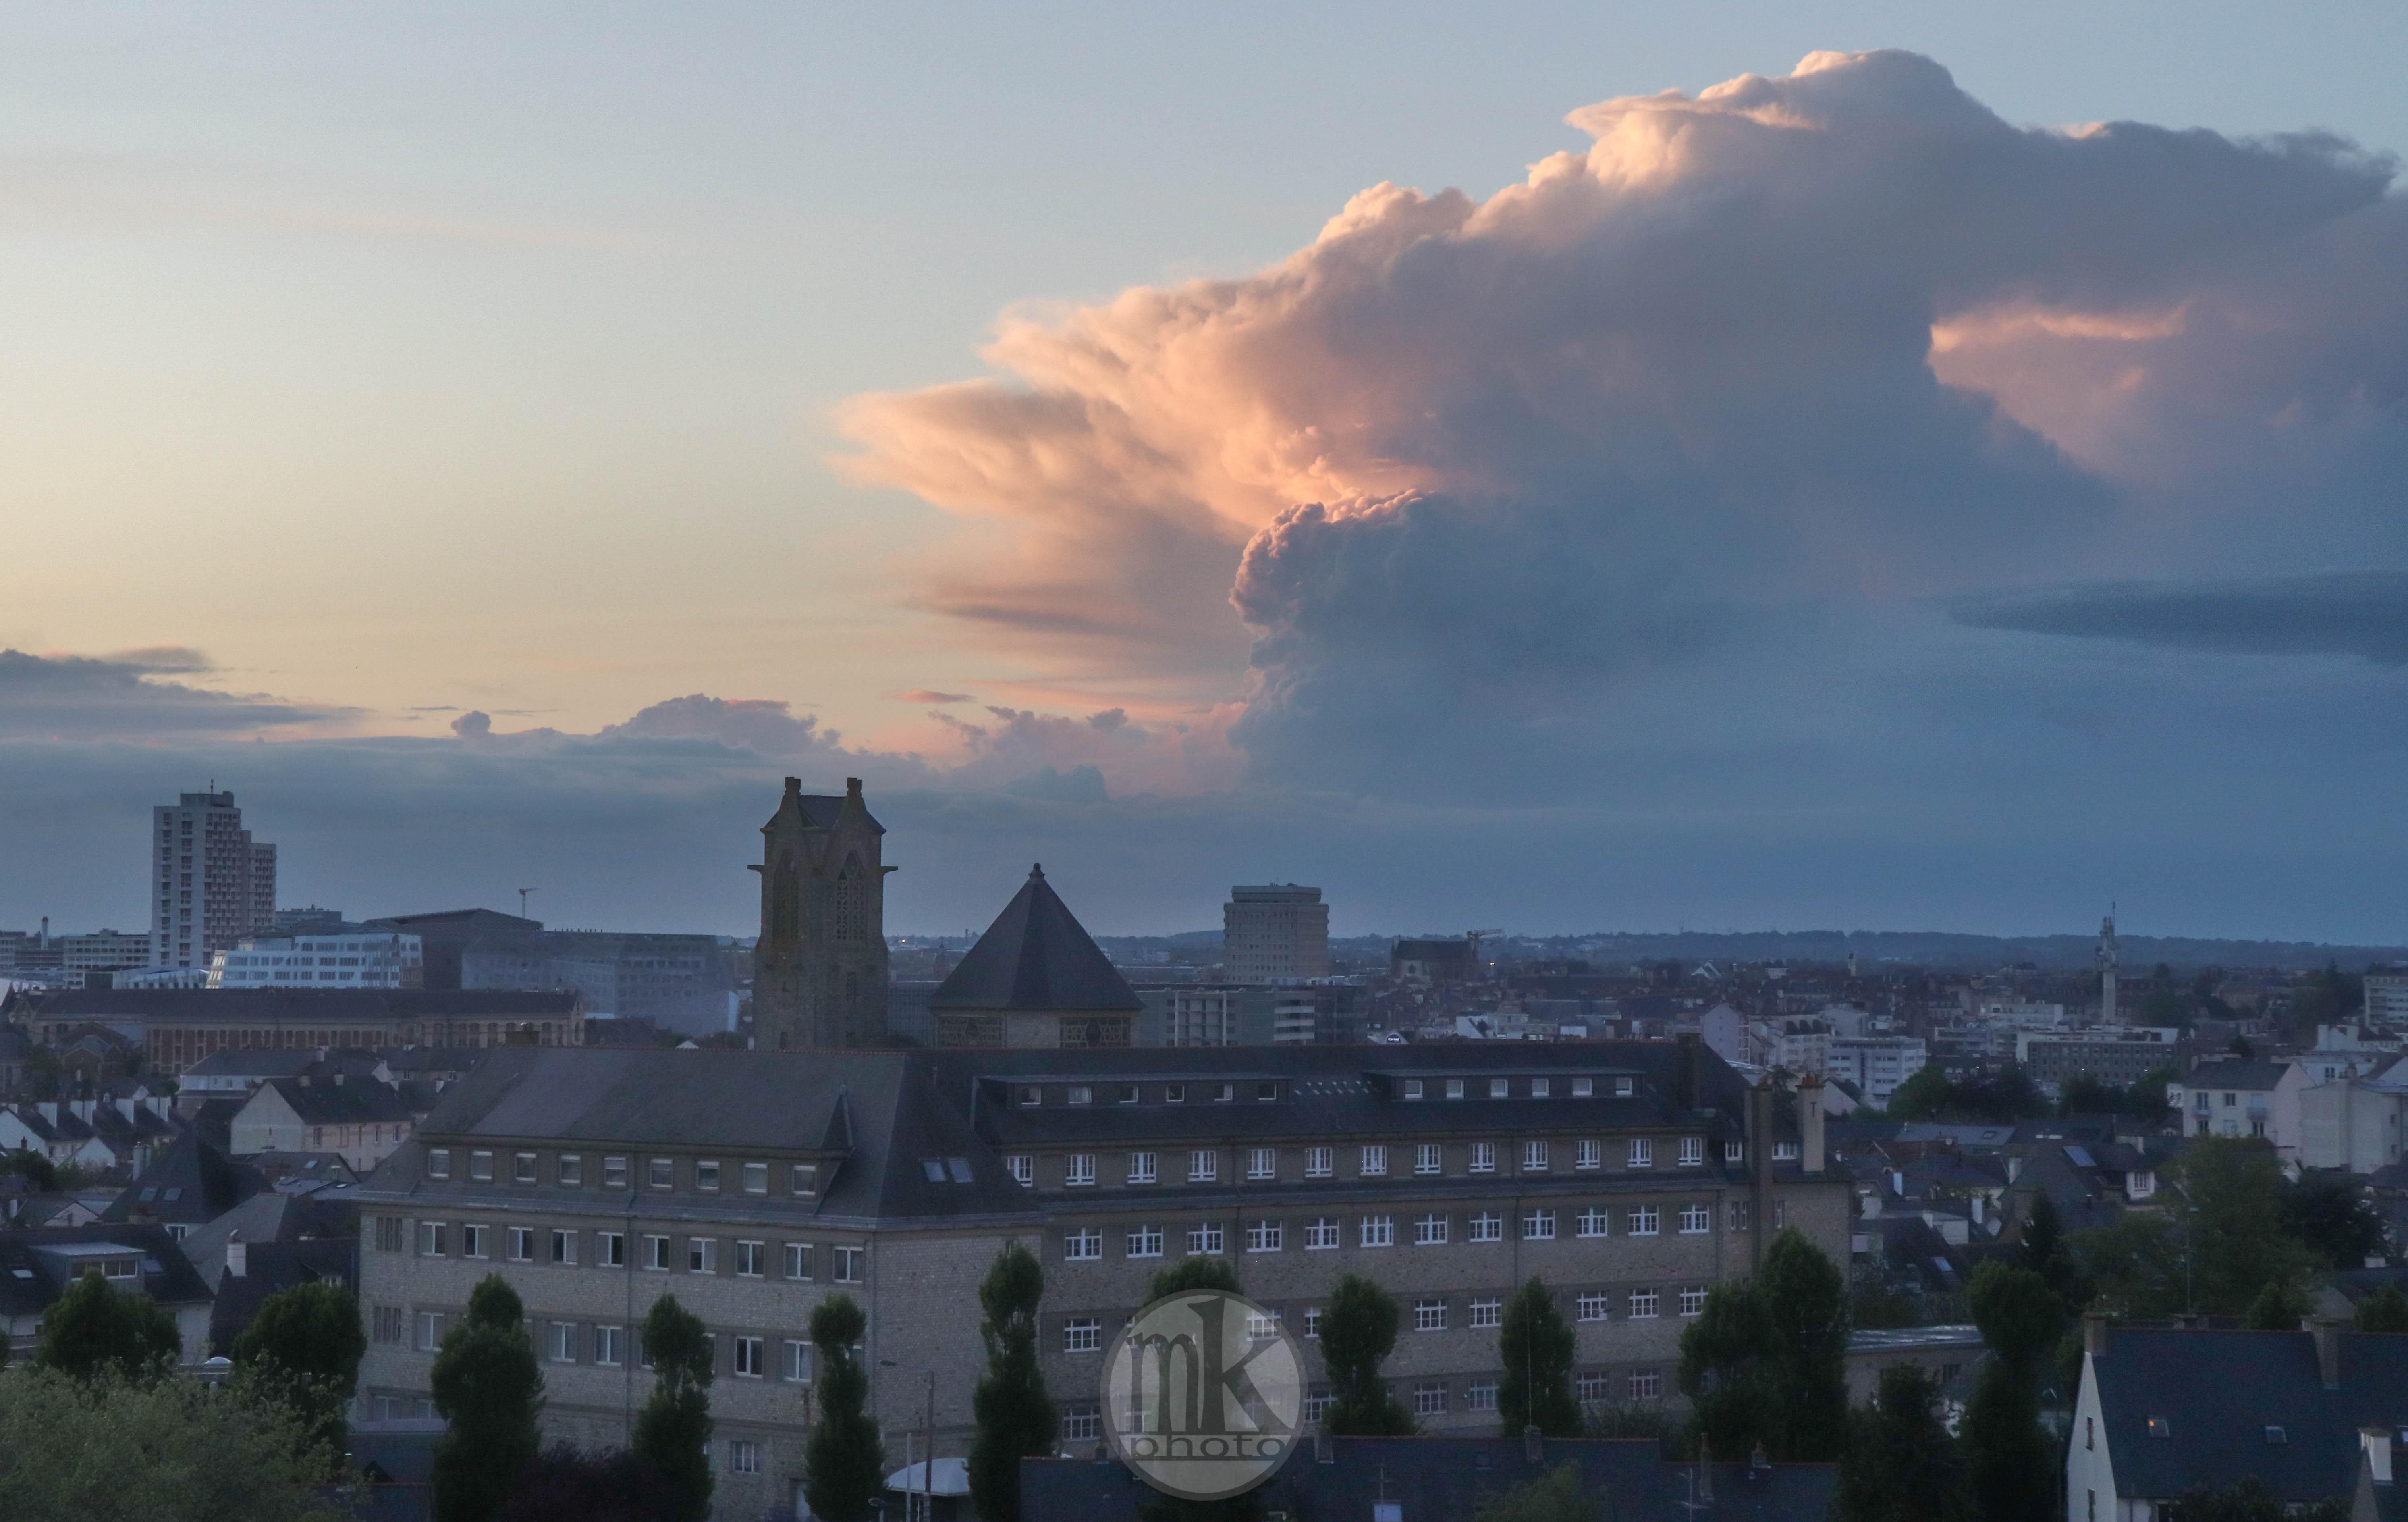 orage après, Rennes, 17 avril 2020, 20h55-10